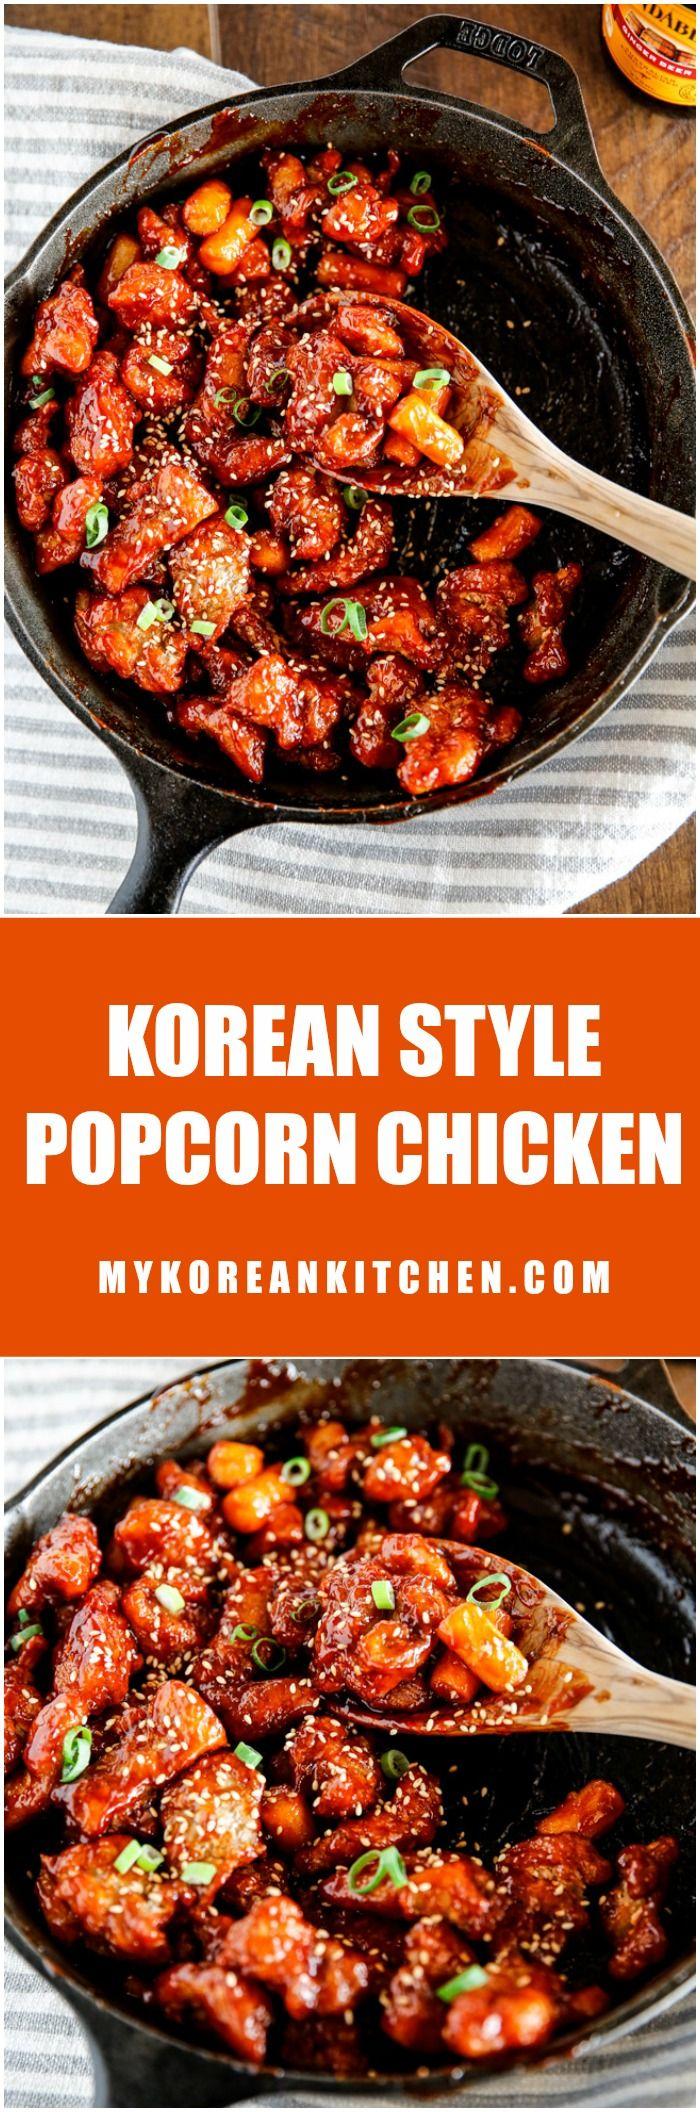 Crispy and sticky Korean style popcorn chicken